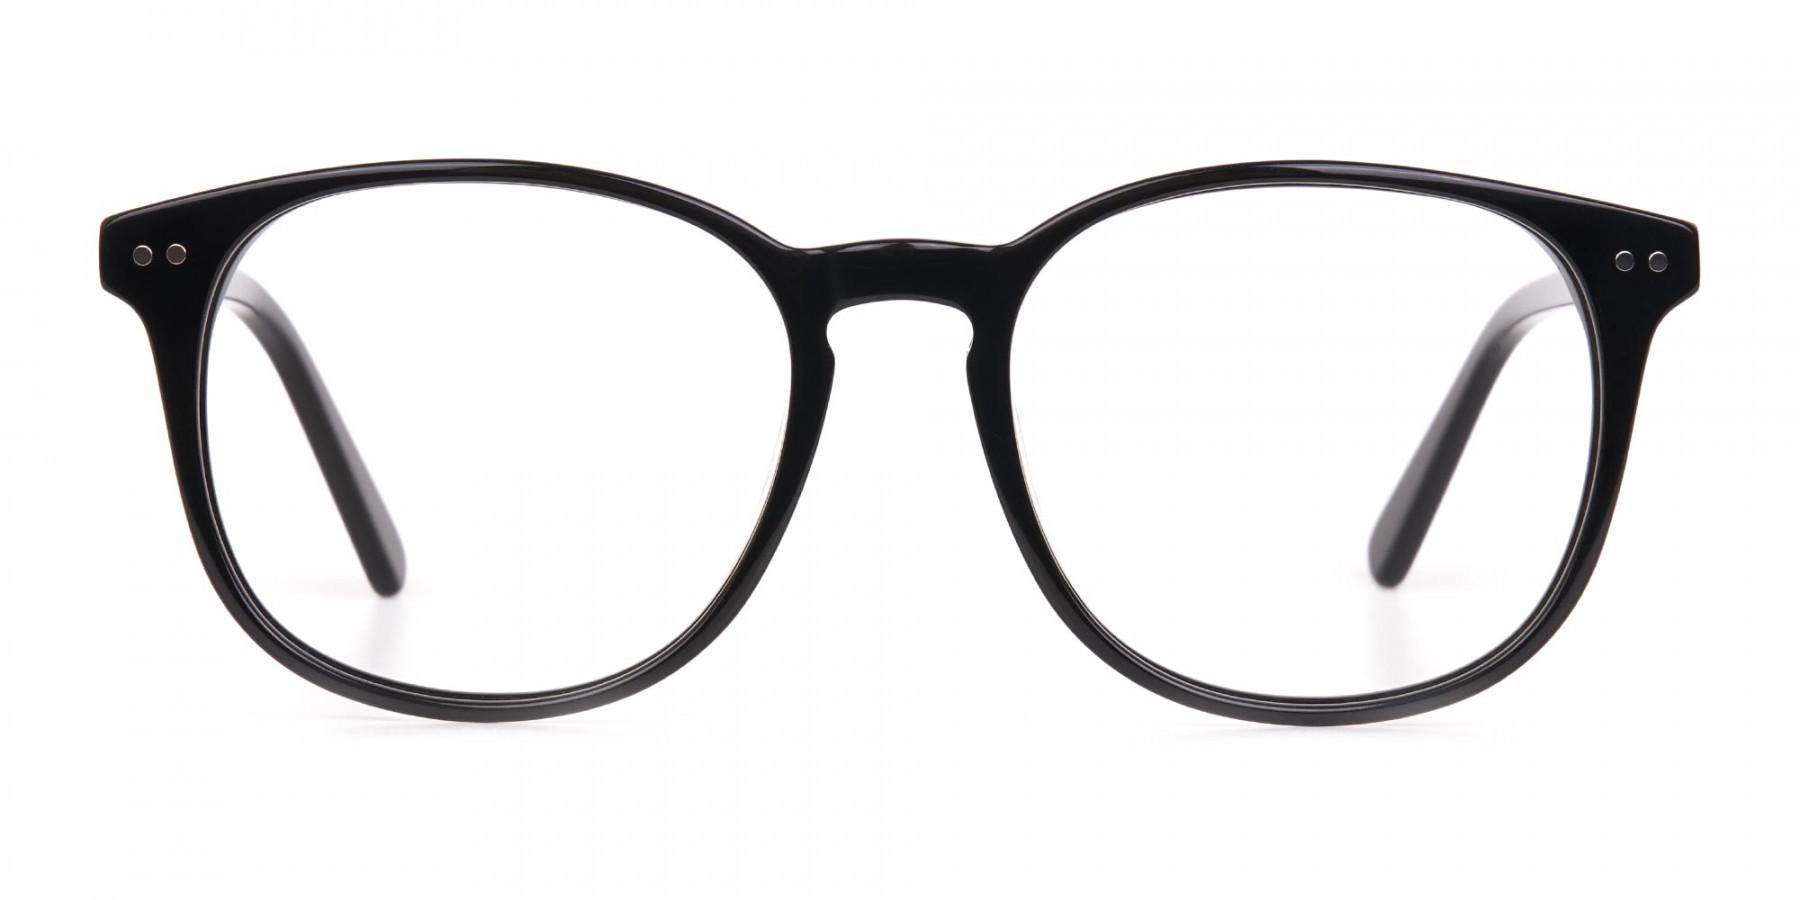 Black Acetate Wayfarer Eyeglasses Unisex-1